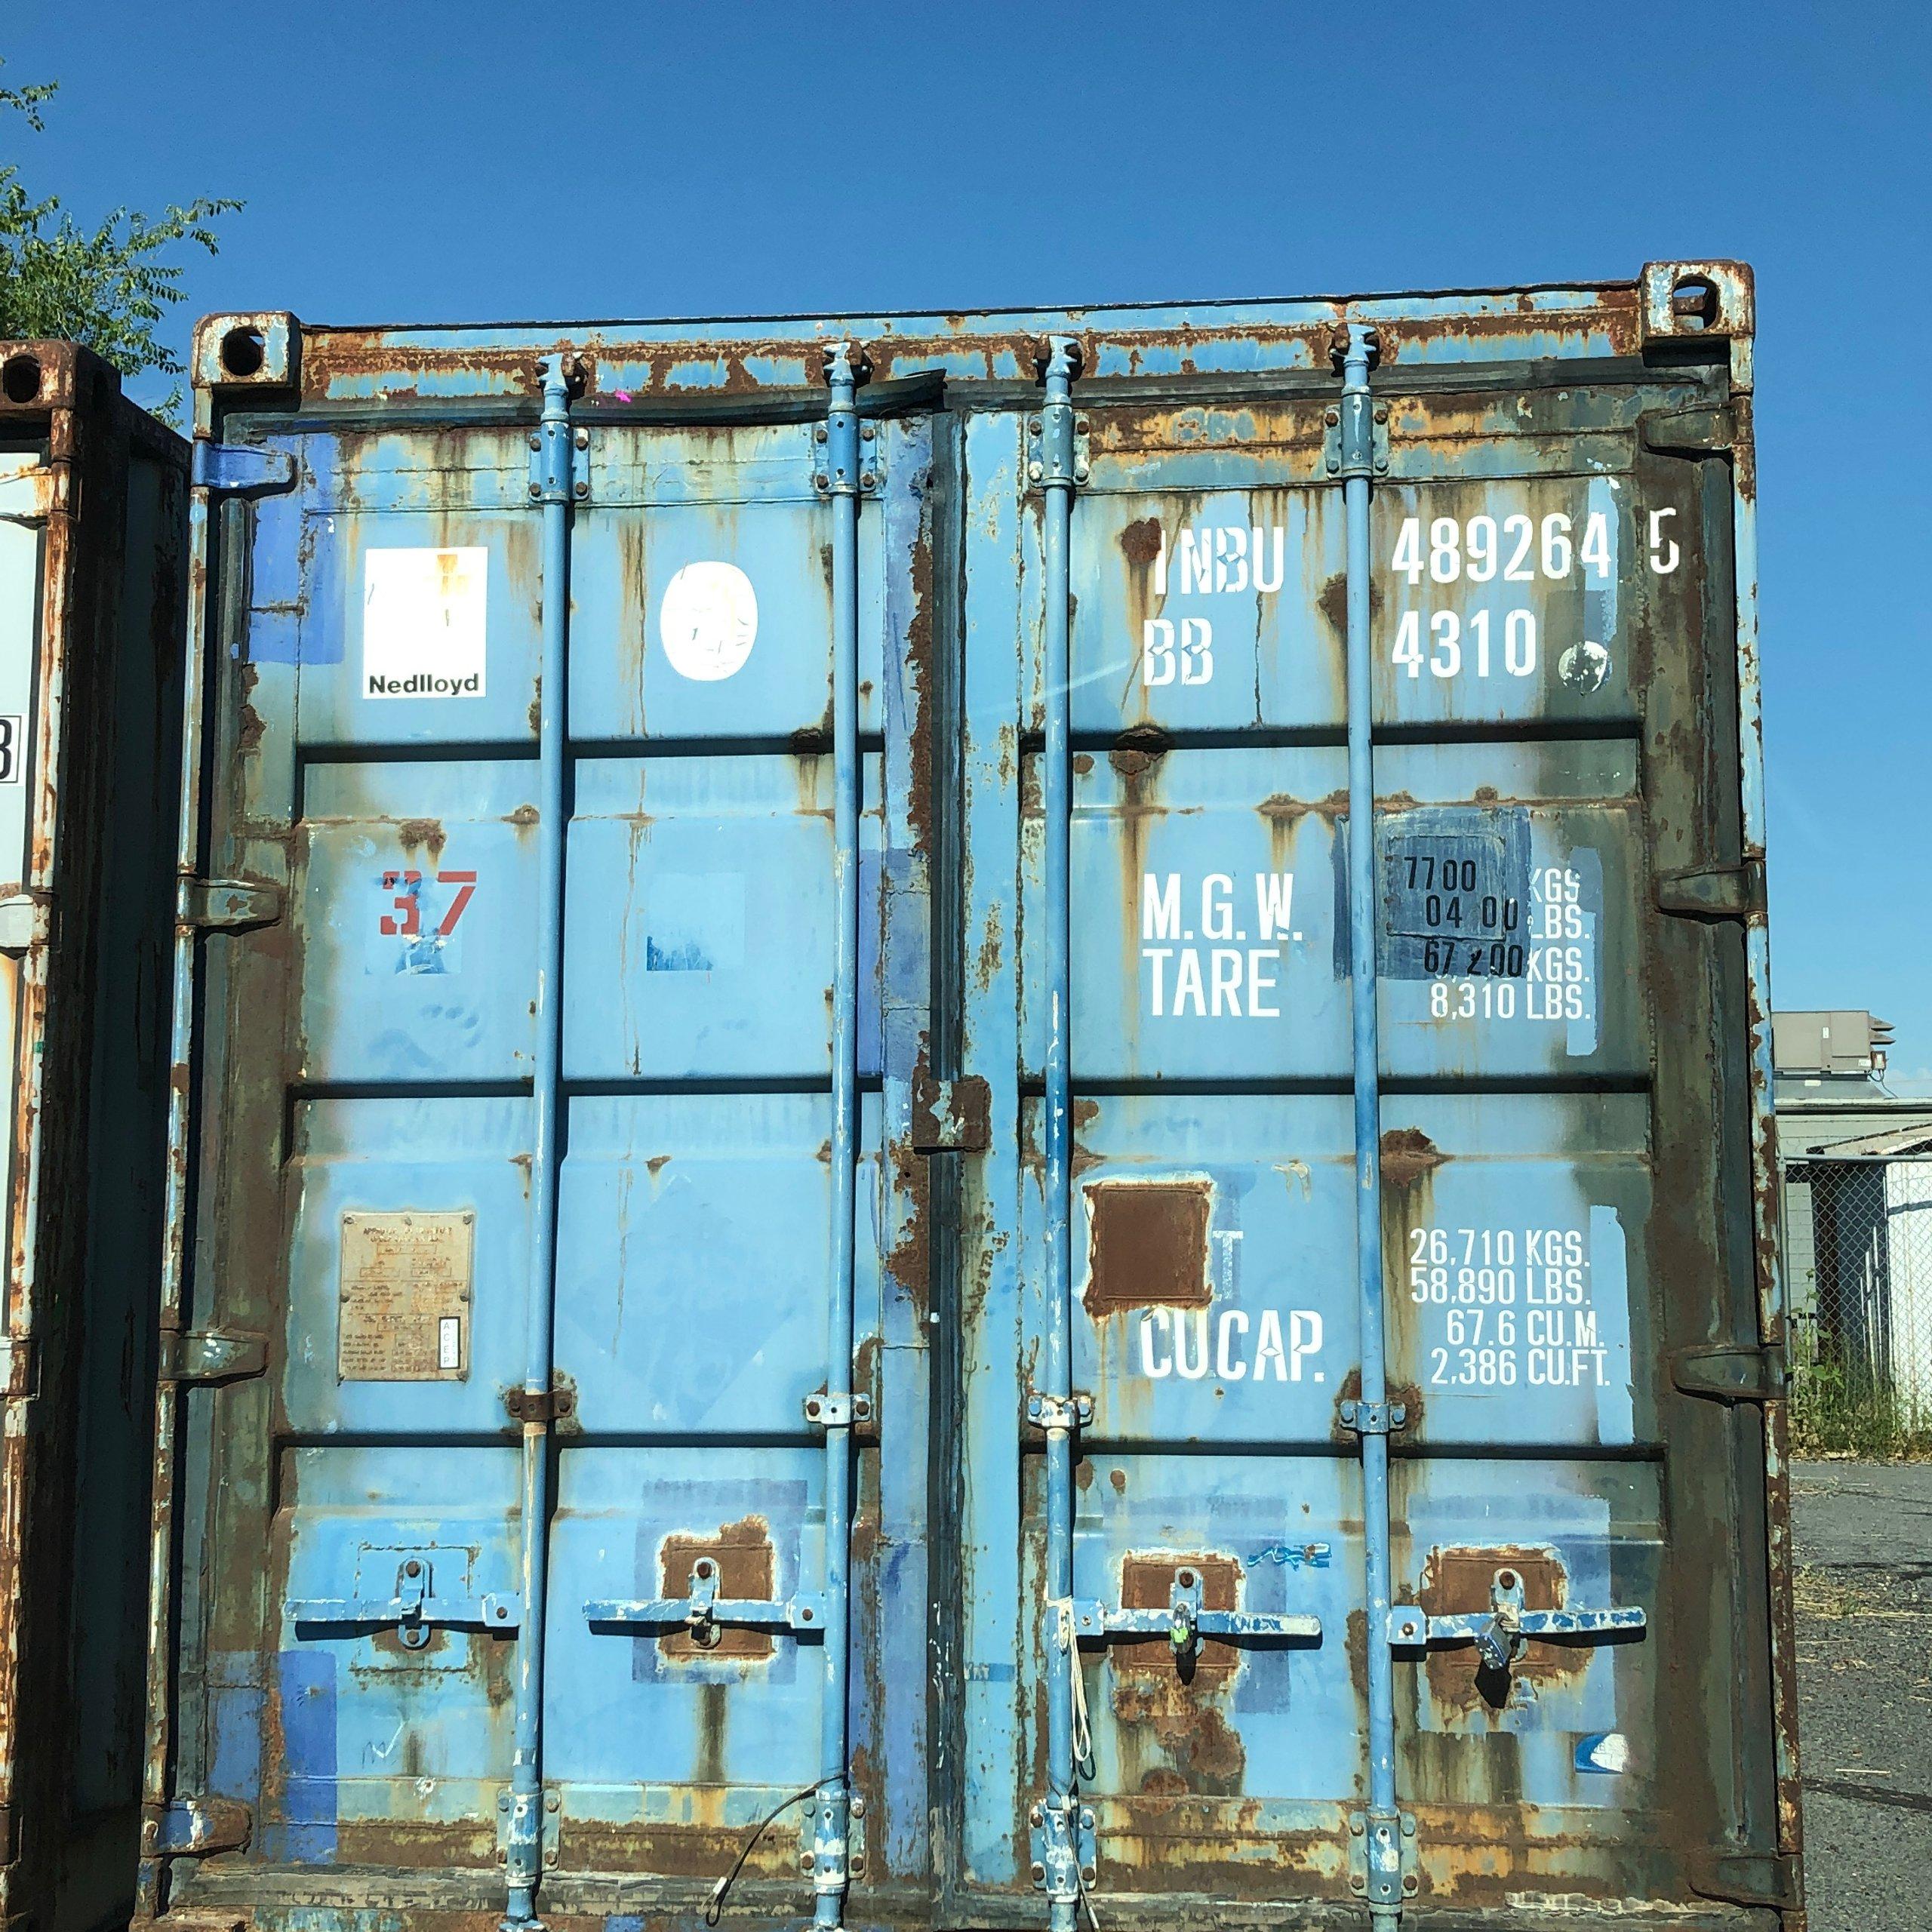 40x8 Warehouse self storage unit